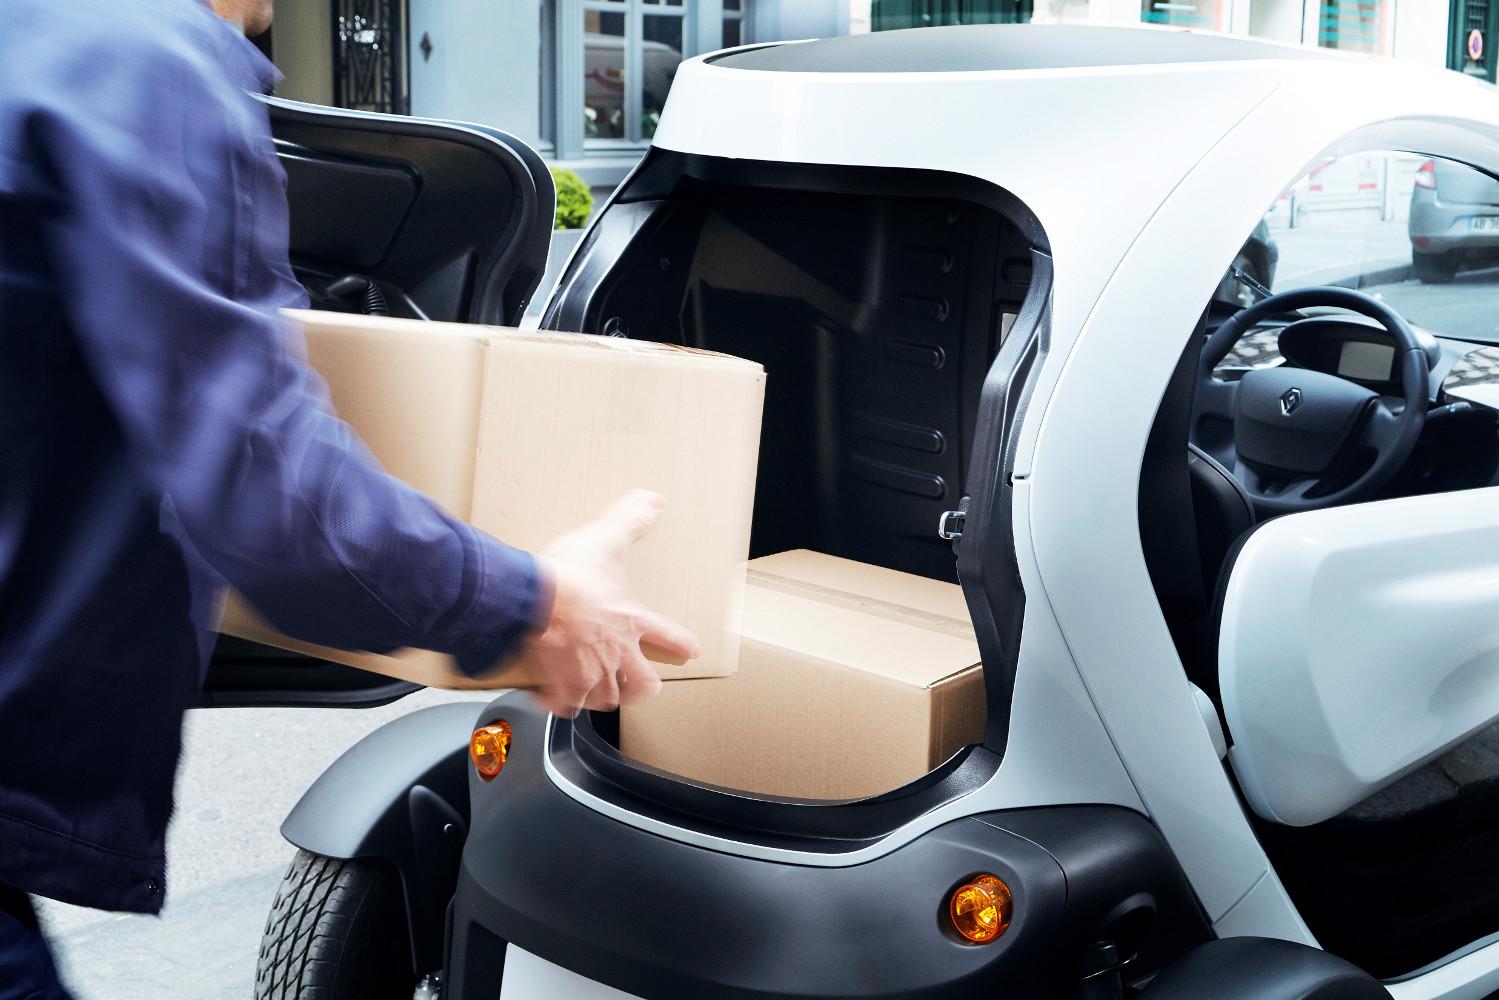 renault twizy cargo 2013 elektroauto blog. Black Bedroom Furniture Sets. Home Design Ideas